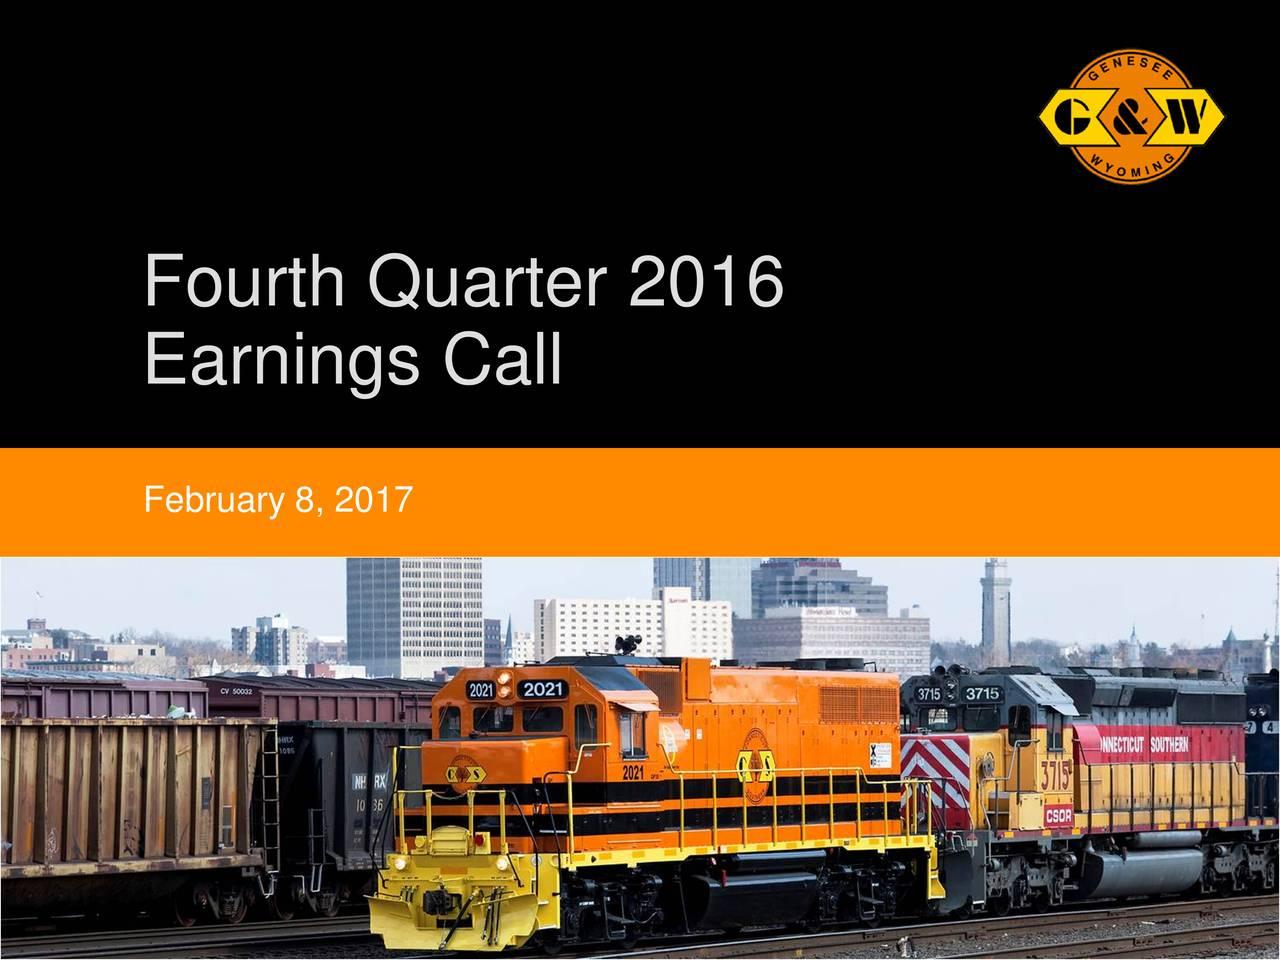 Earnings Call February 8, 2017 Genesee & Wyoming Inc. 1